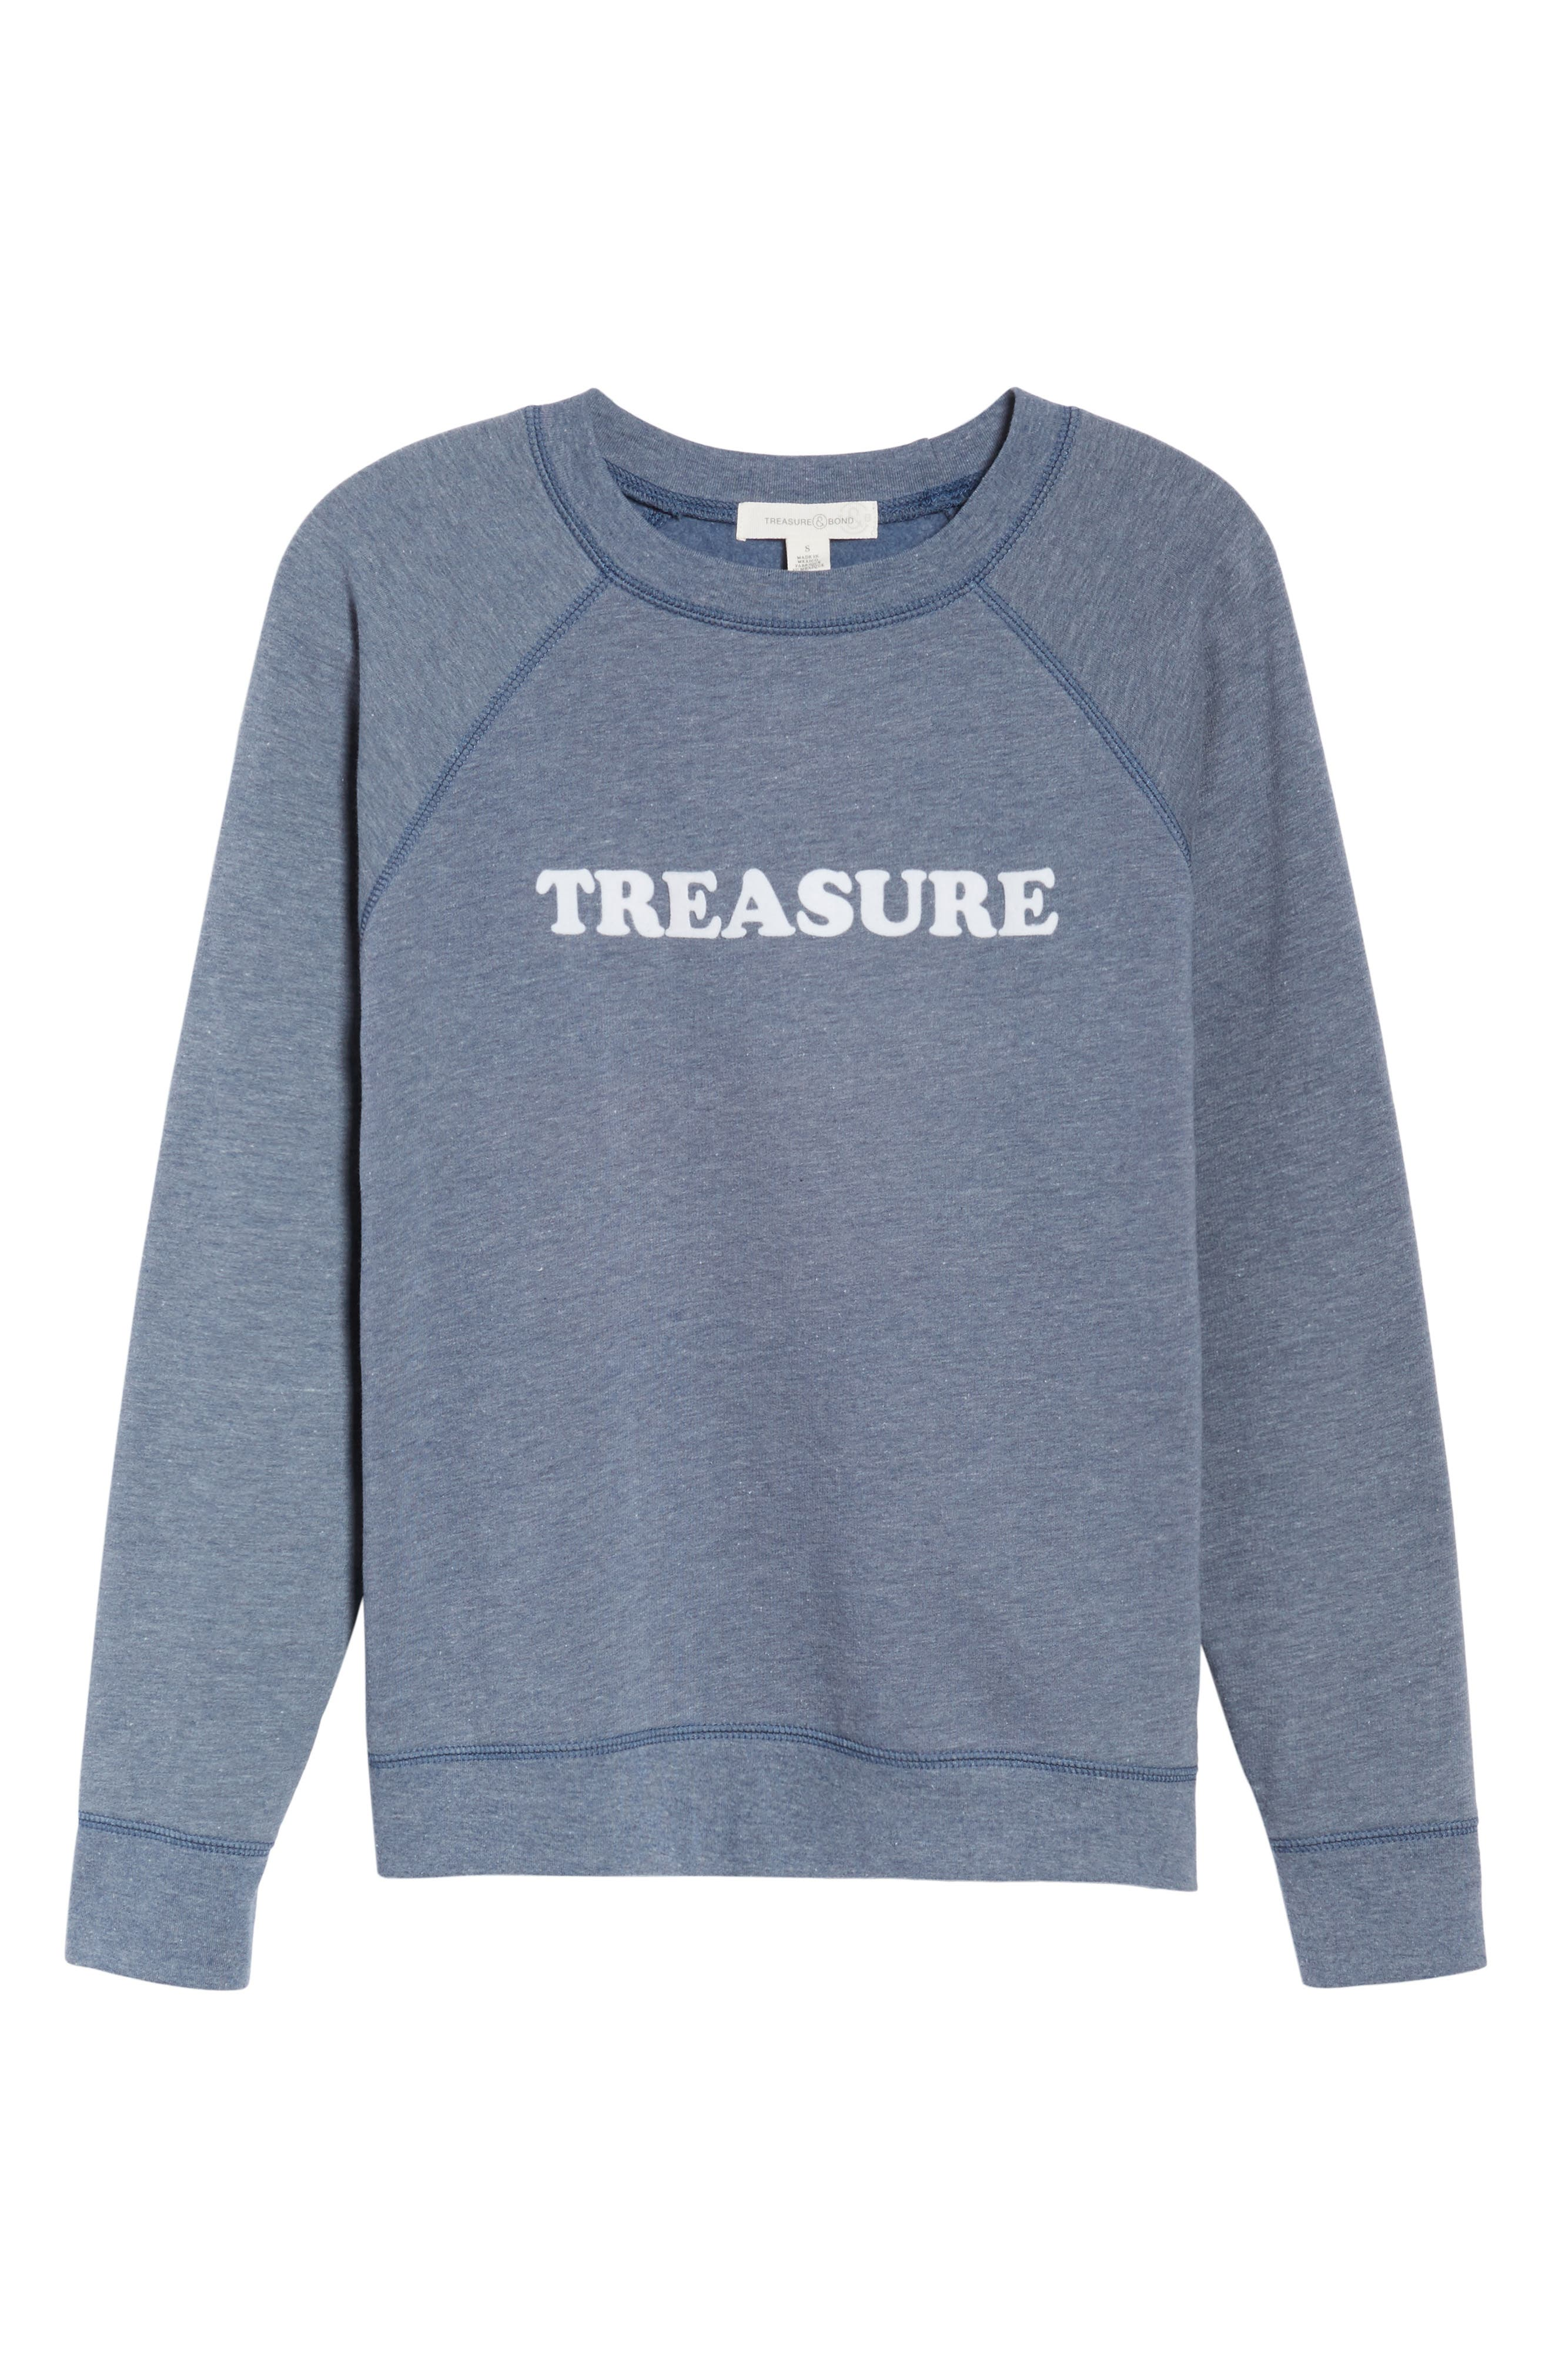 Crewneck Sweatshirt,                             Alternate thumbnail 6, color,                             Blue Insignia Treasure